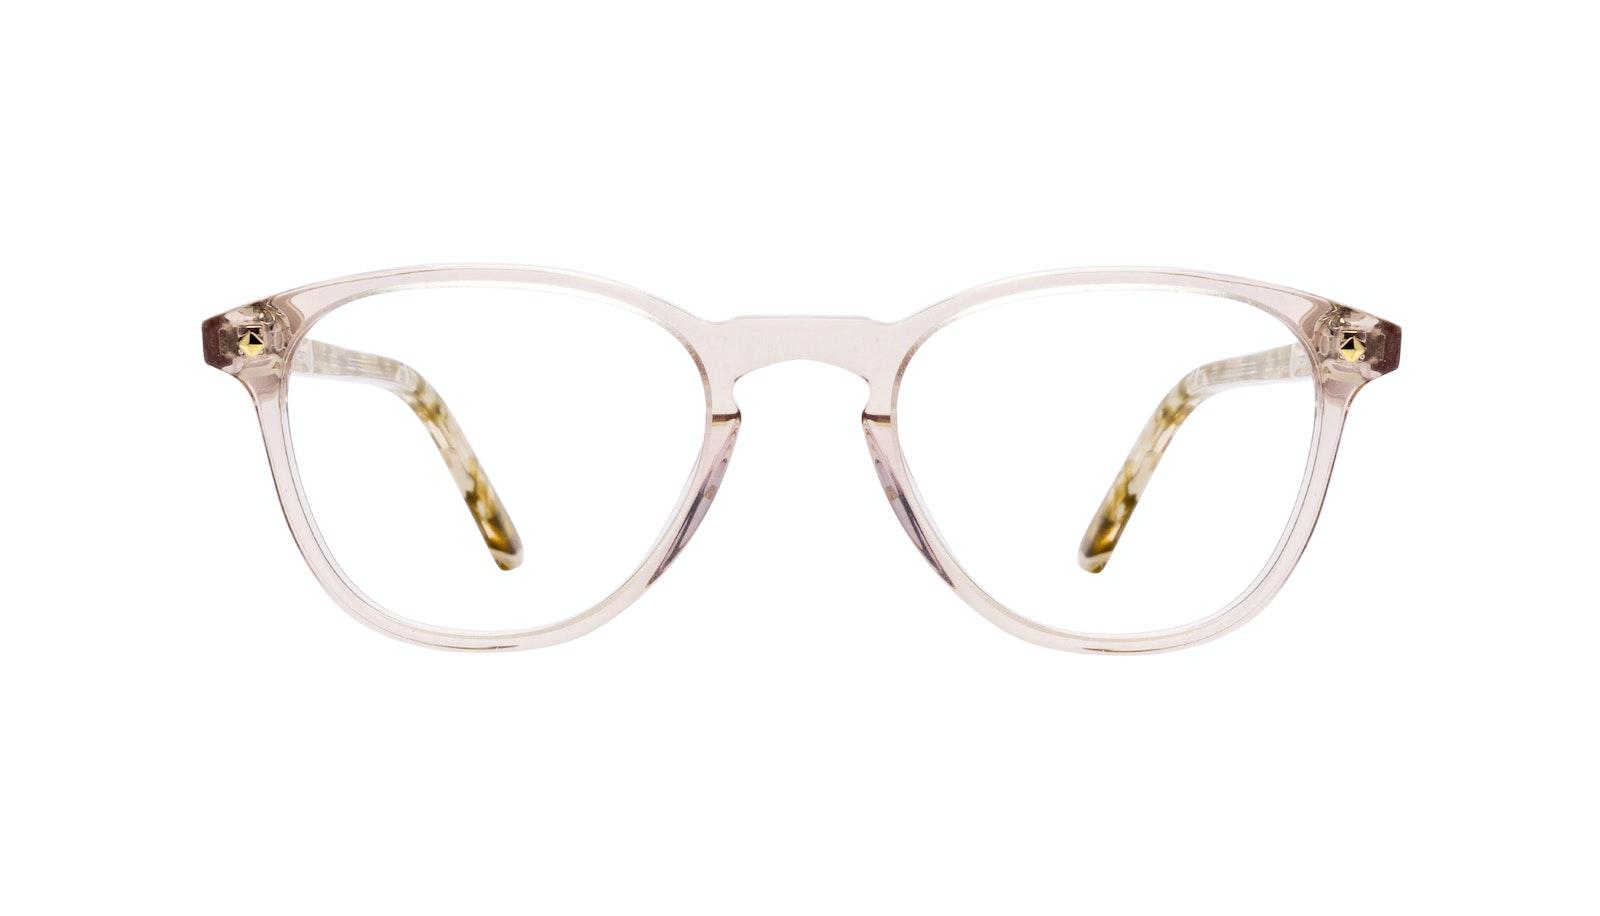 Affordable Fashion Glasses Round Eyeglasses Women Crush Rose